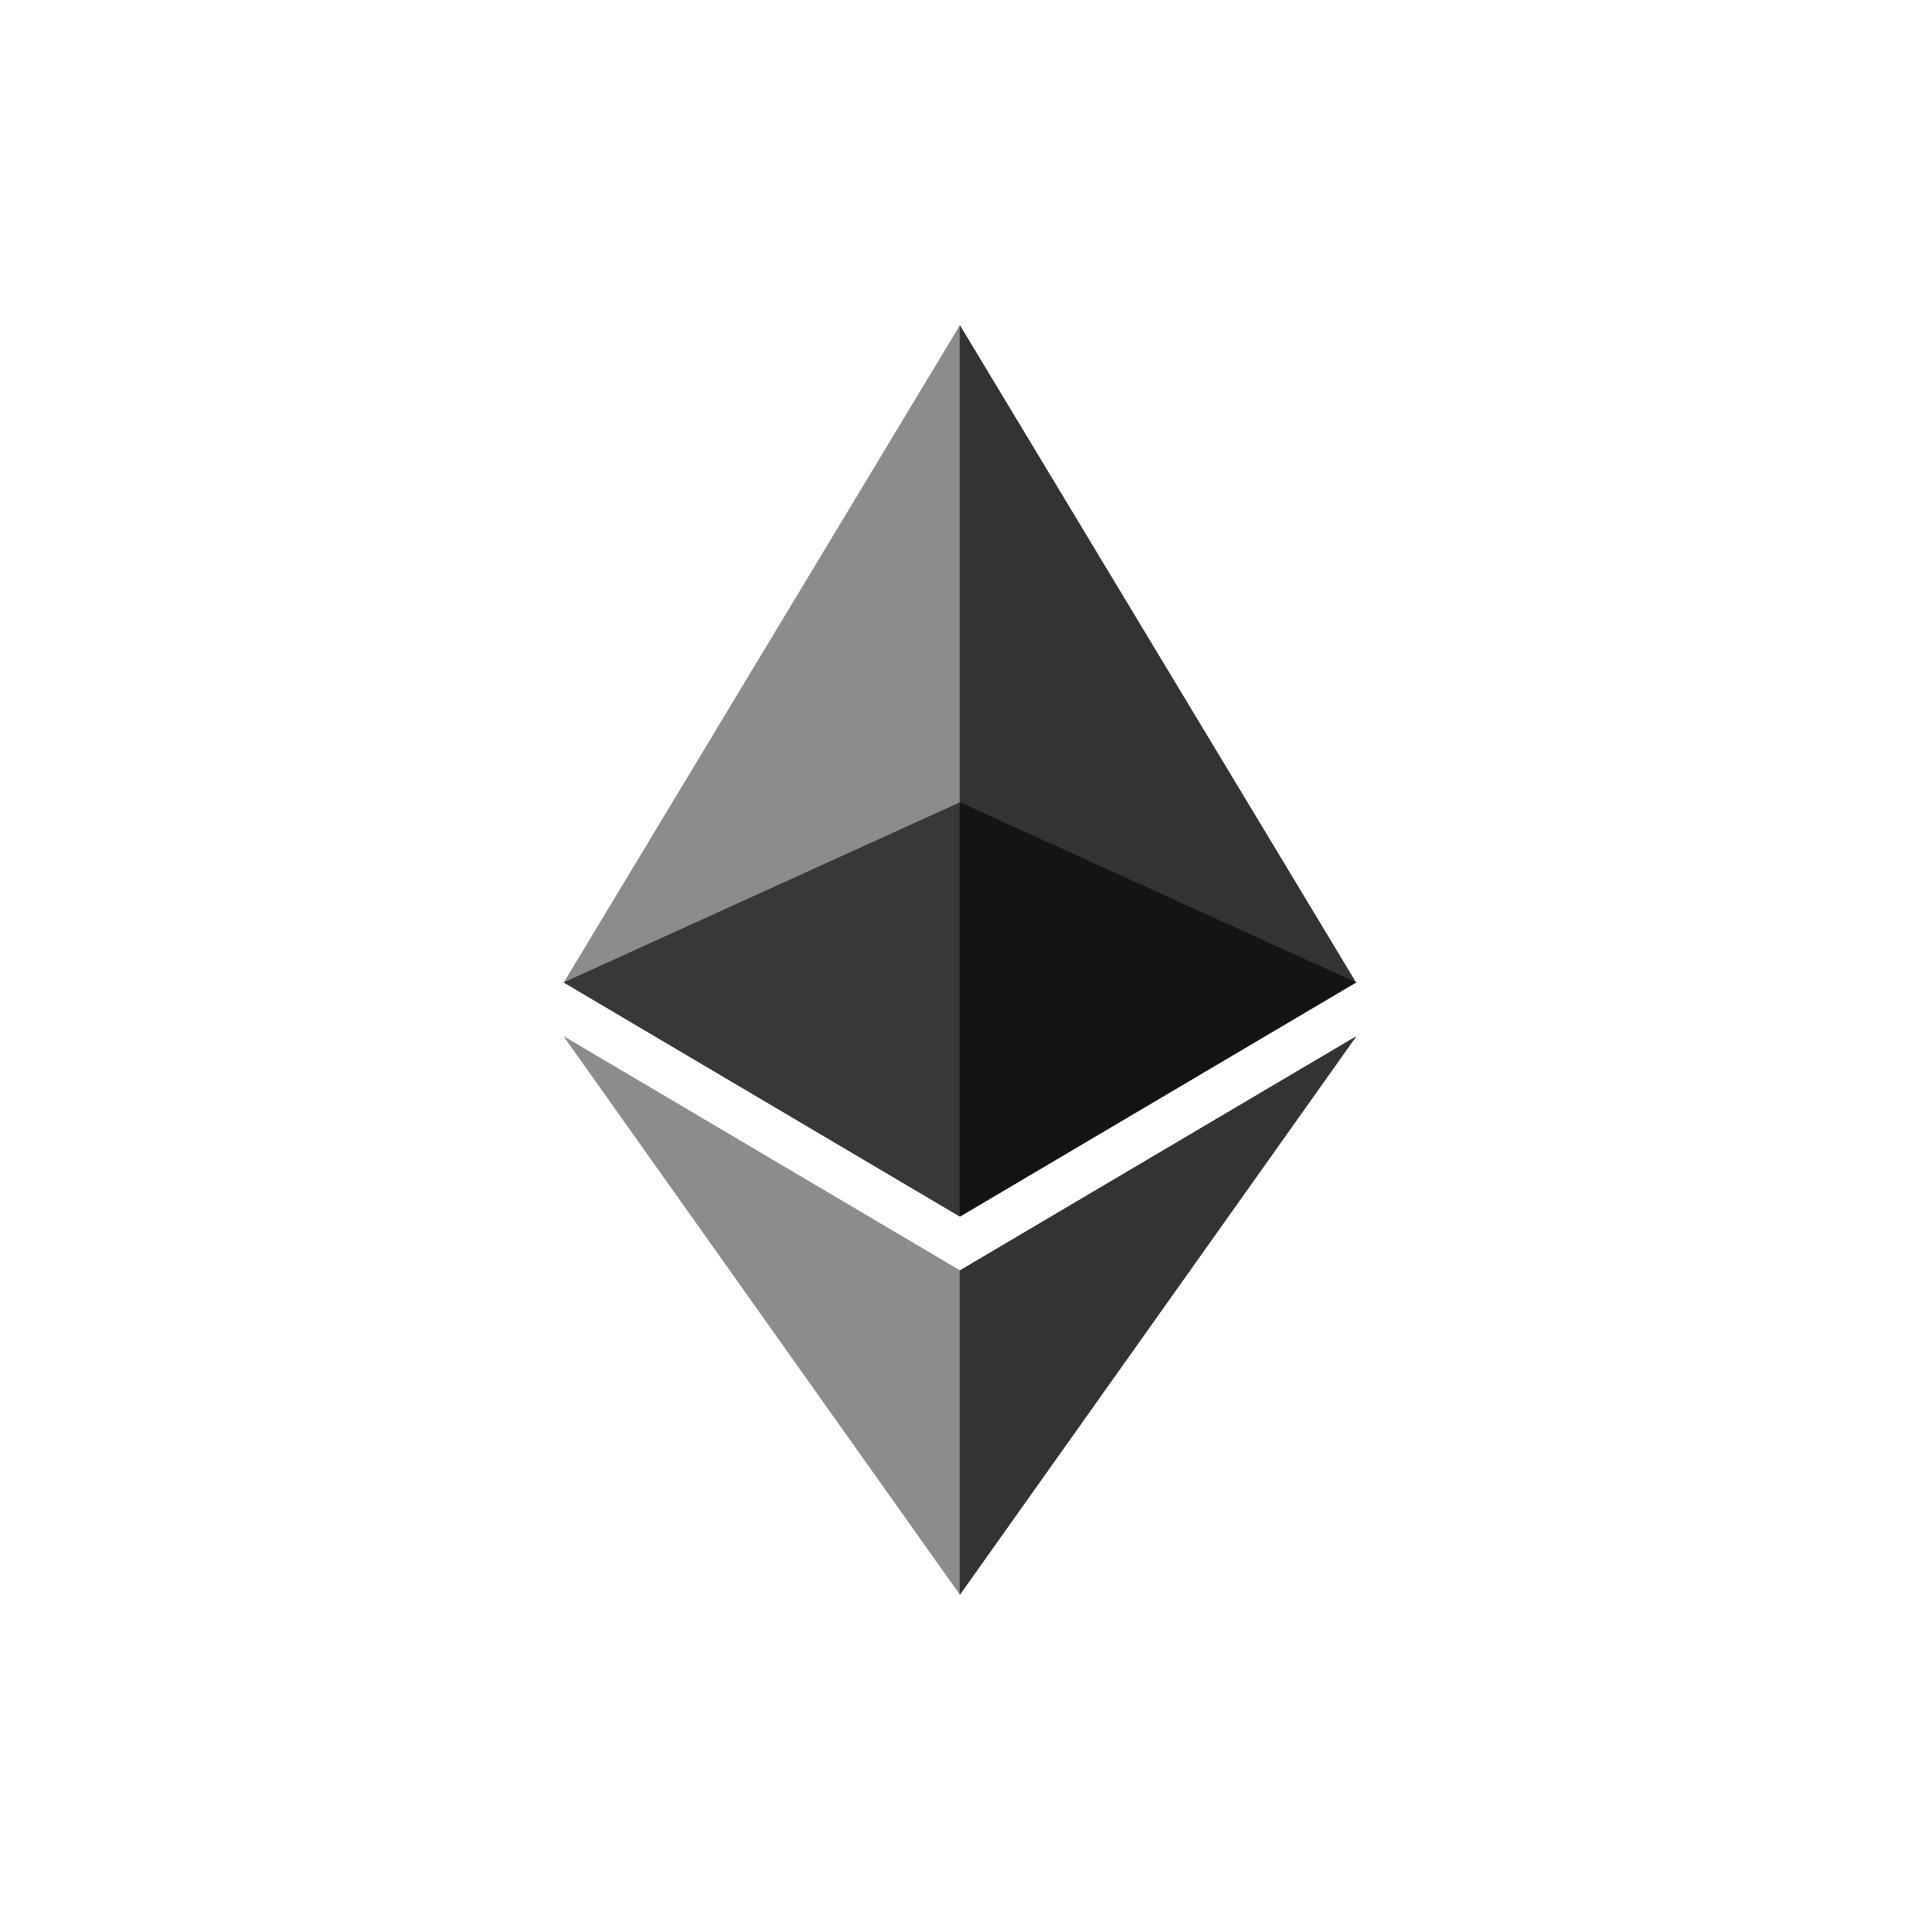 Fpga bitcoin miner schematics